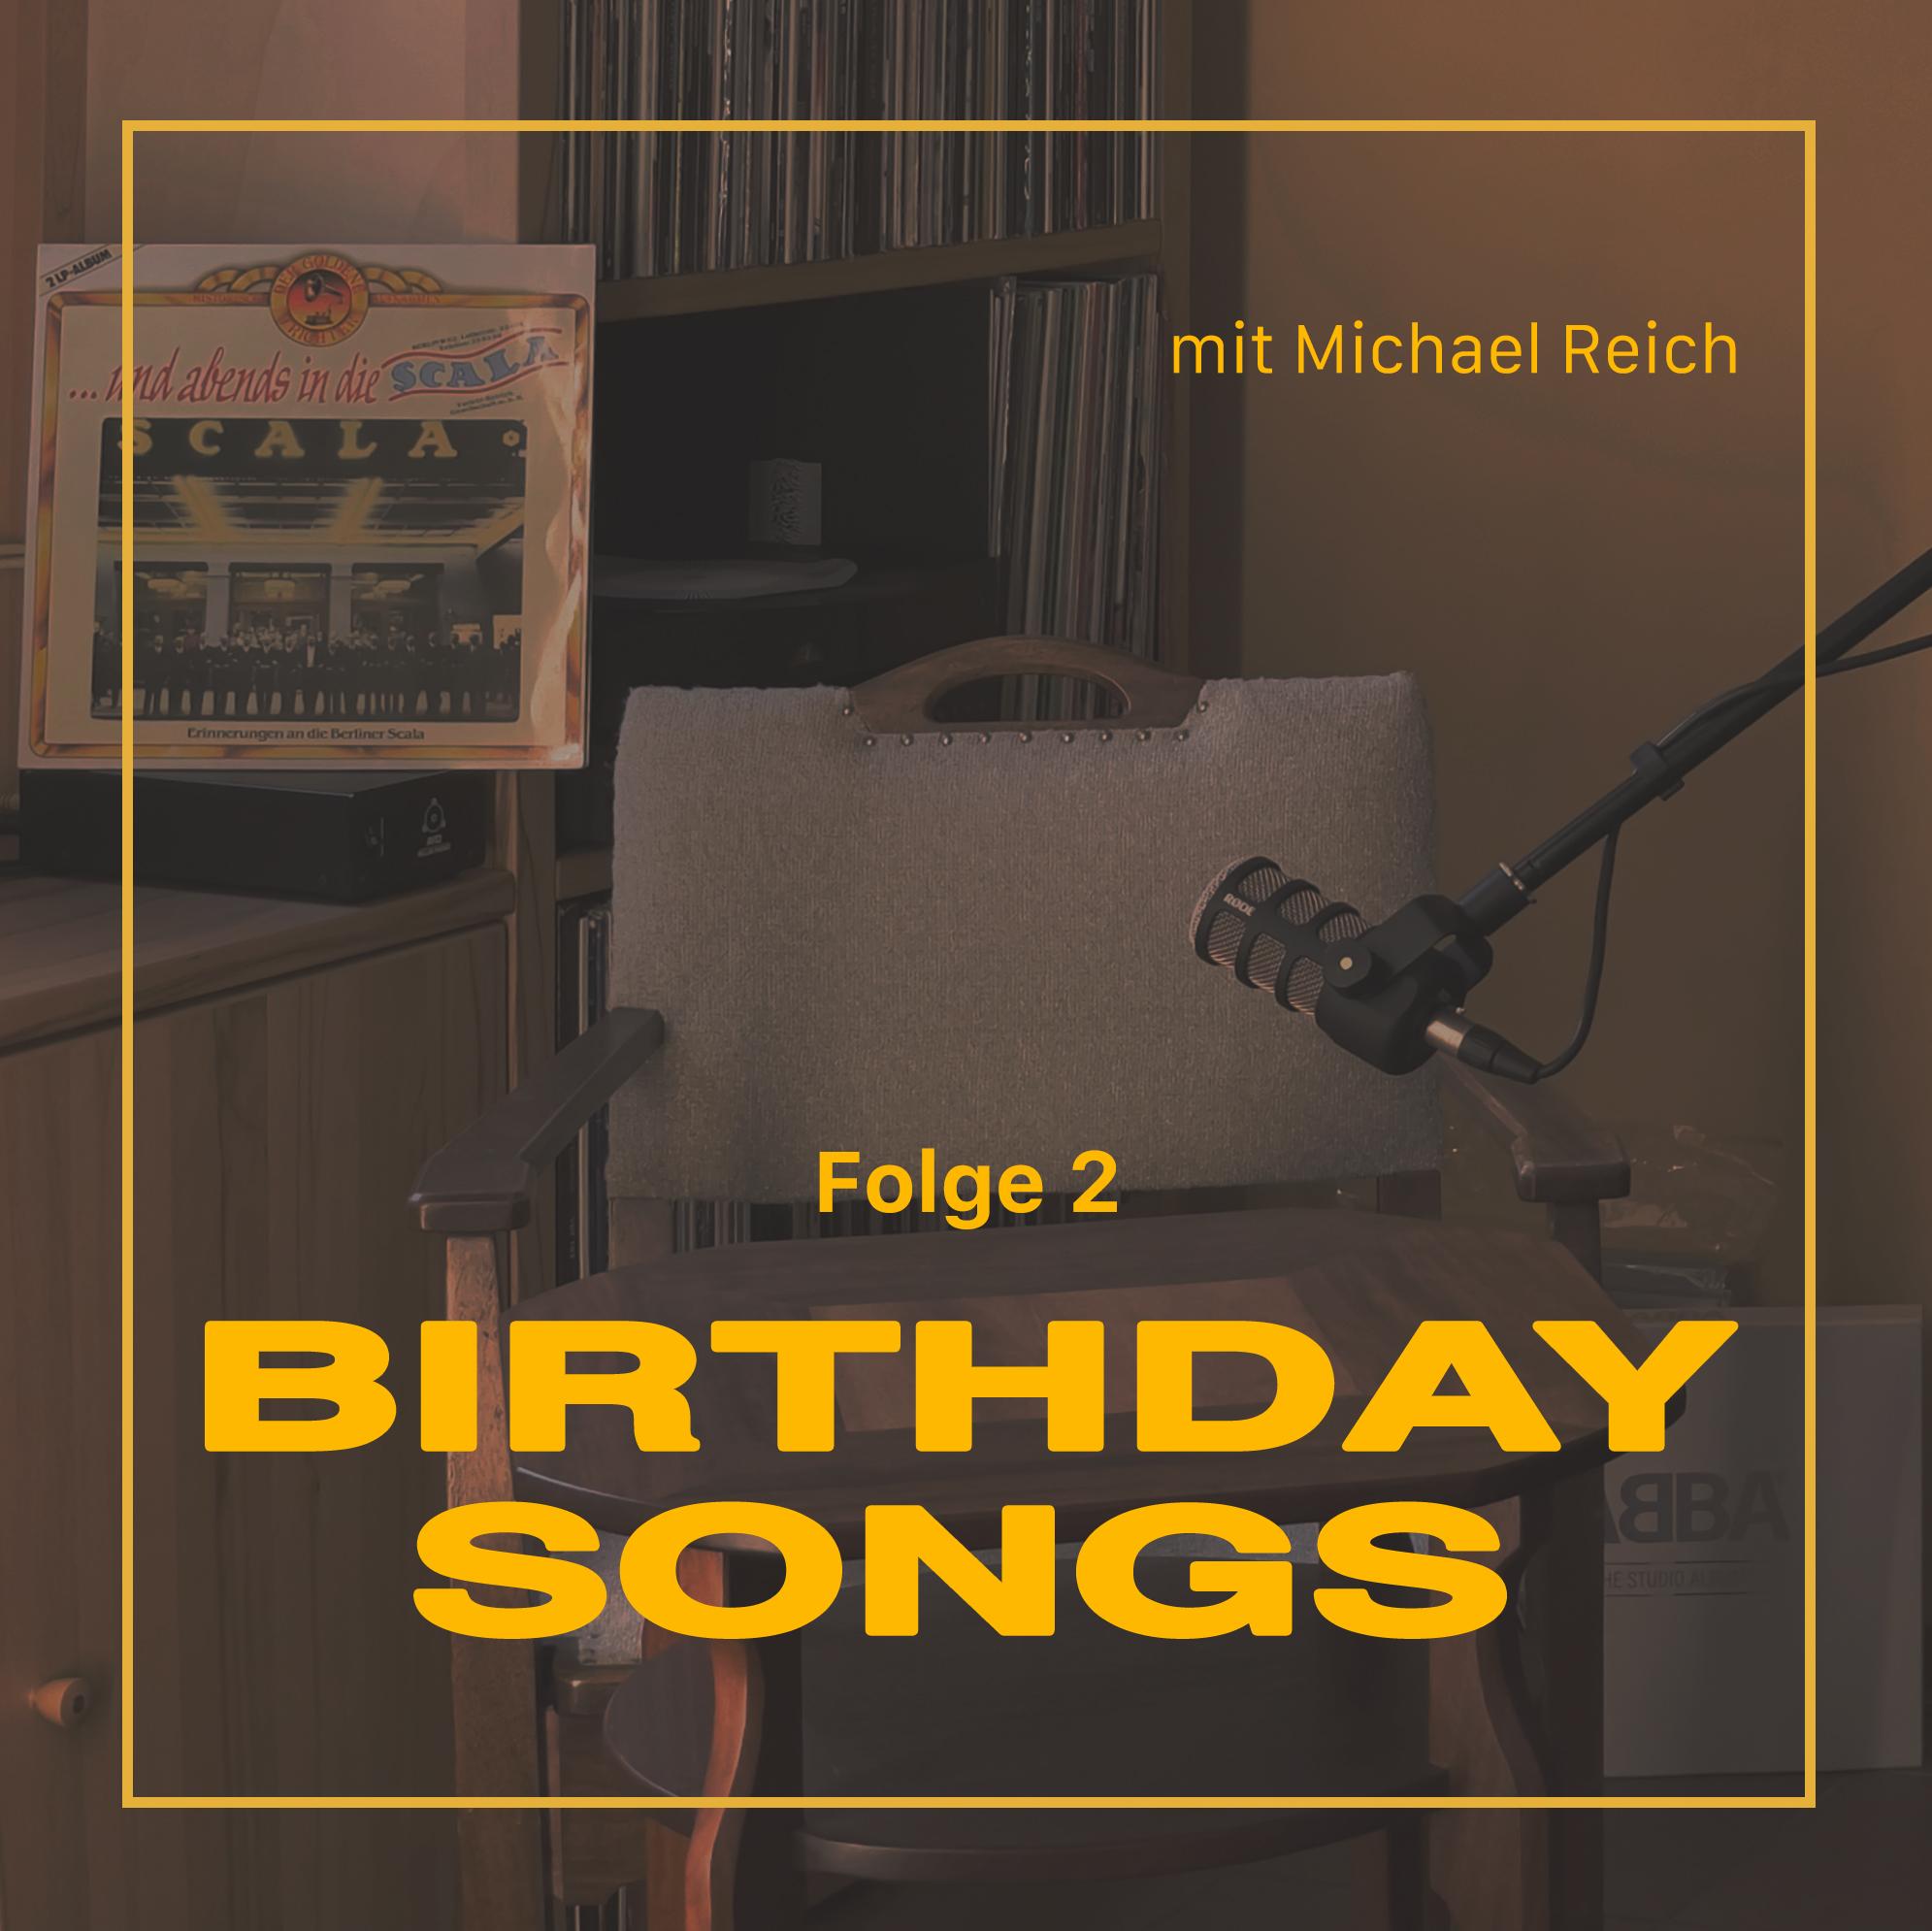 Birthday Songs Folge 2